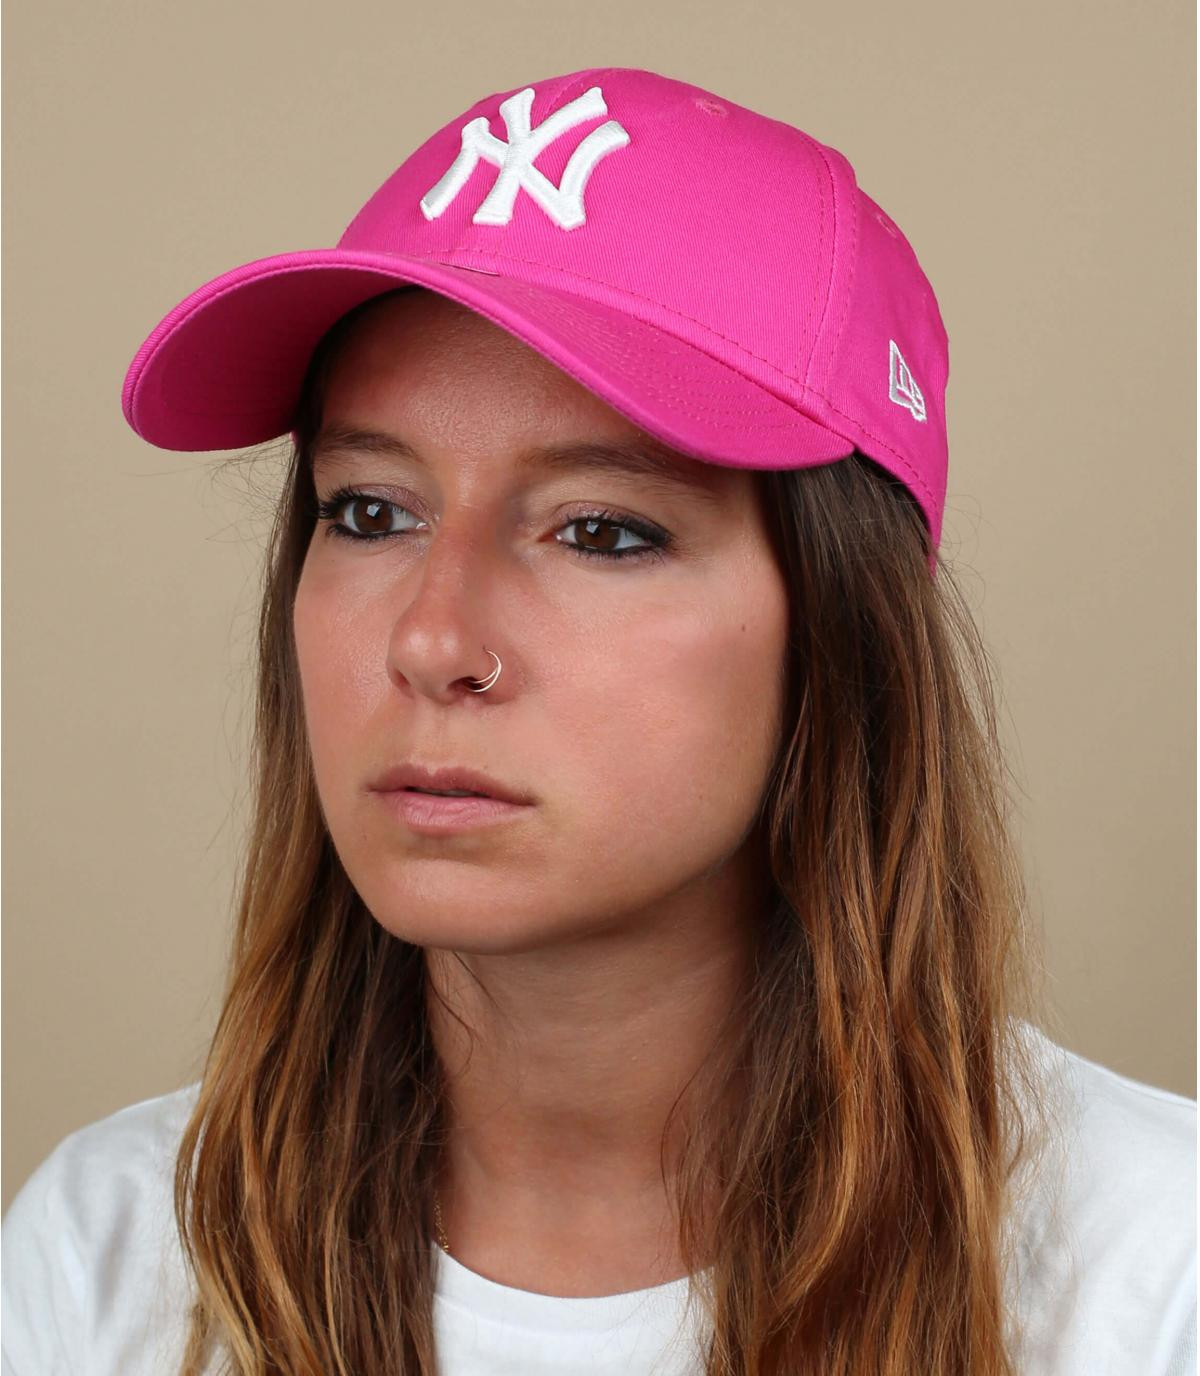 Roze curved visor cap